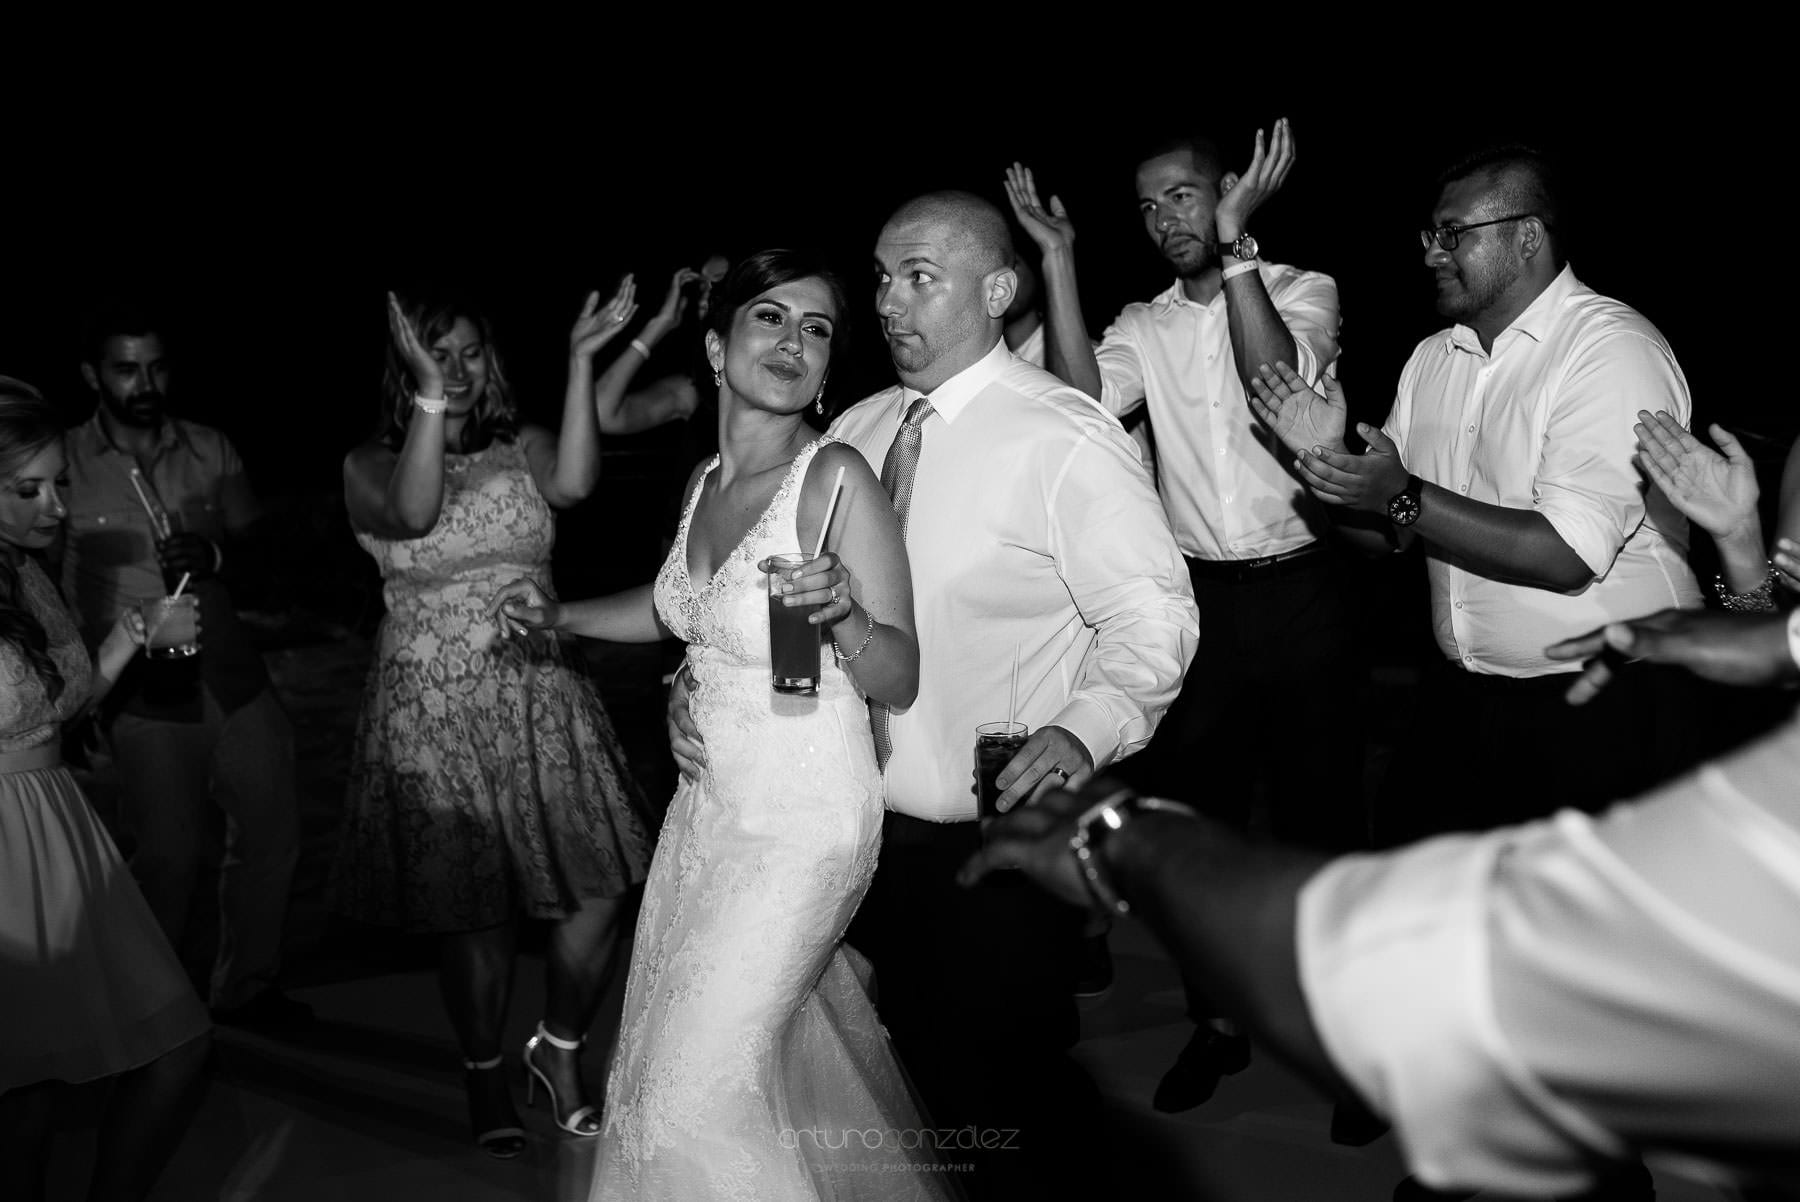 wedding-photos-pueblo-bonito-sunset-beach-4638